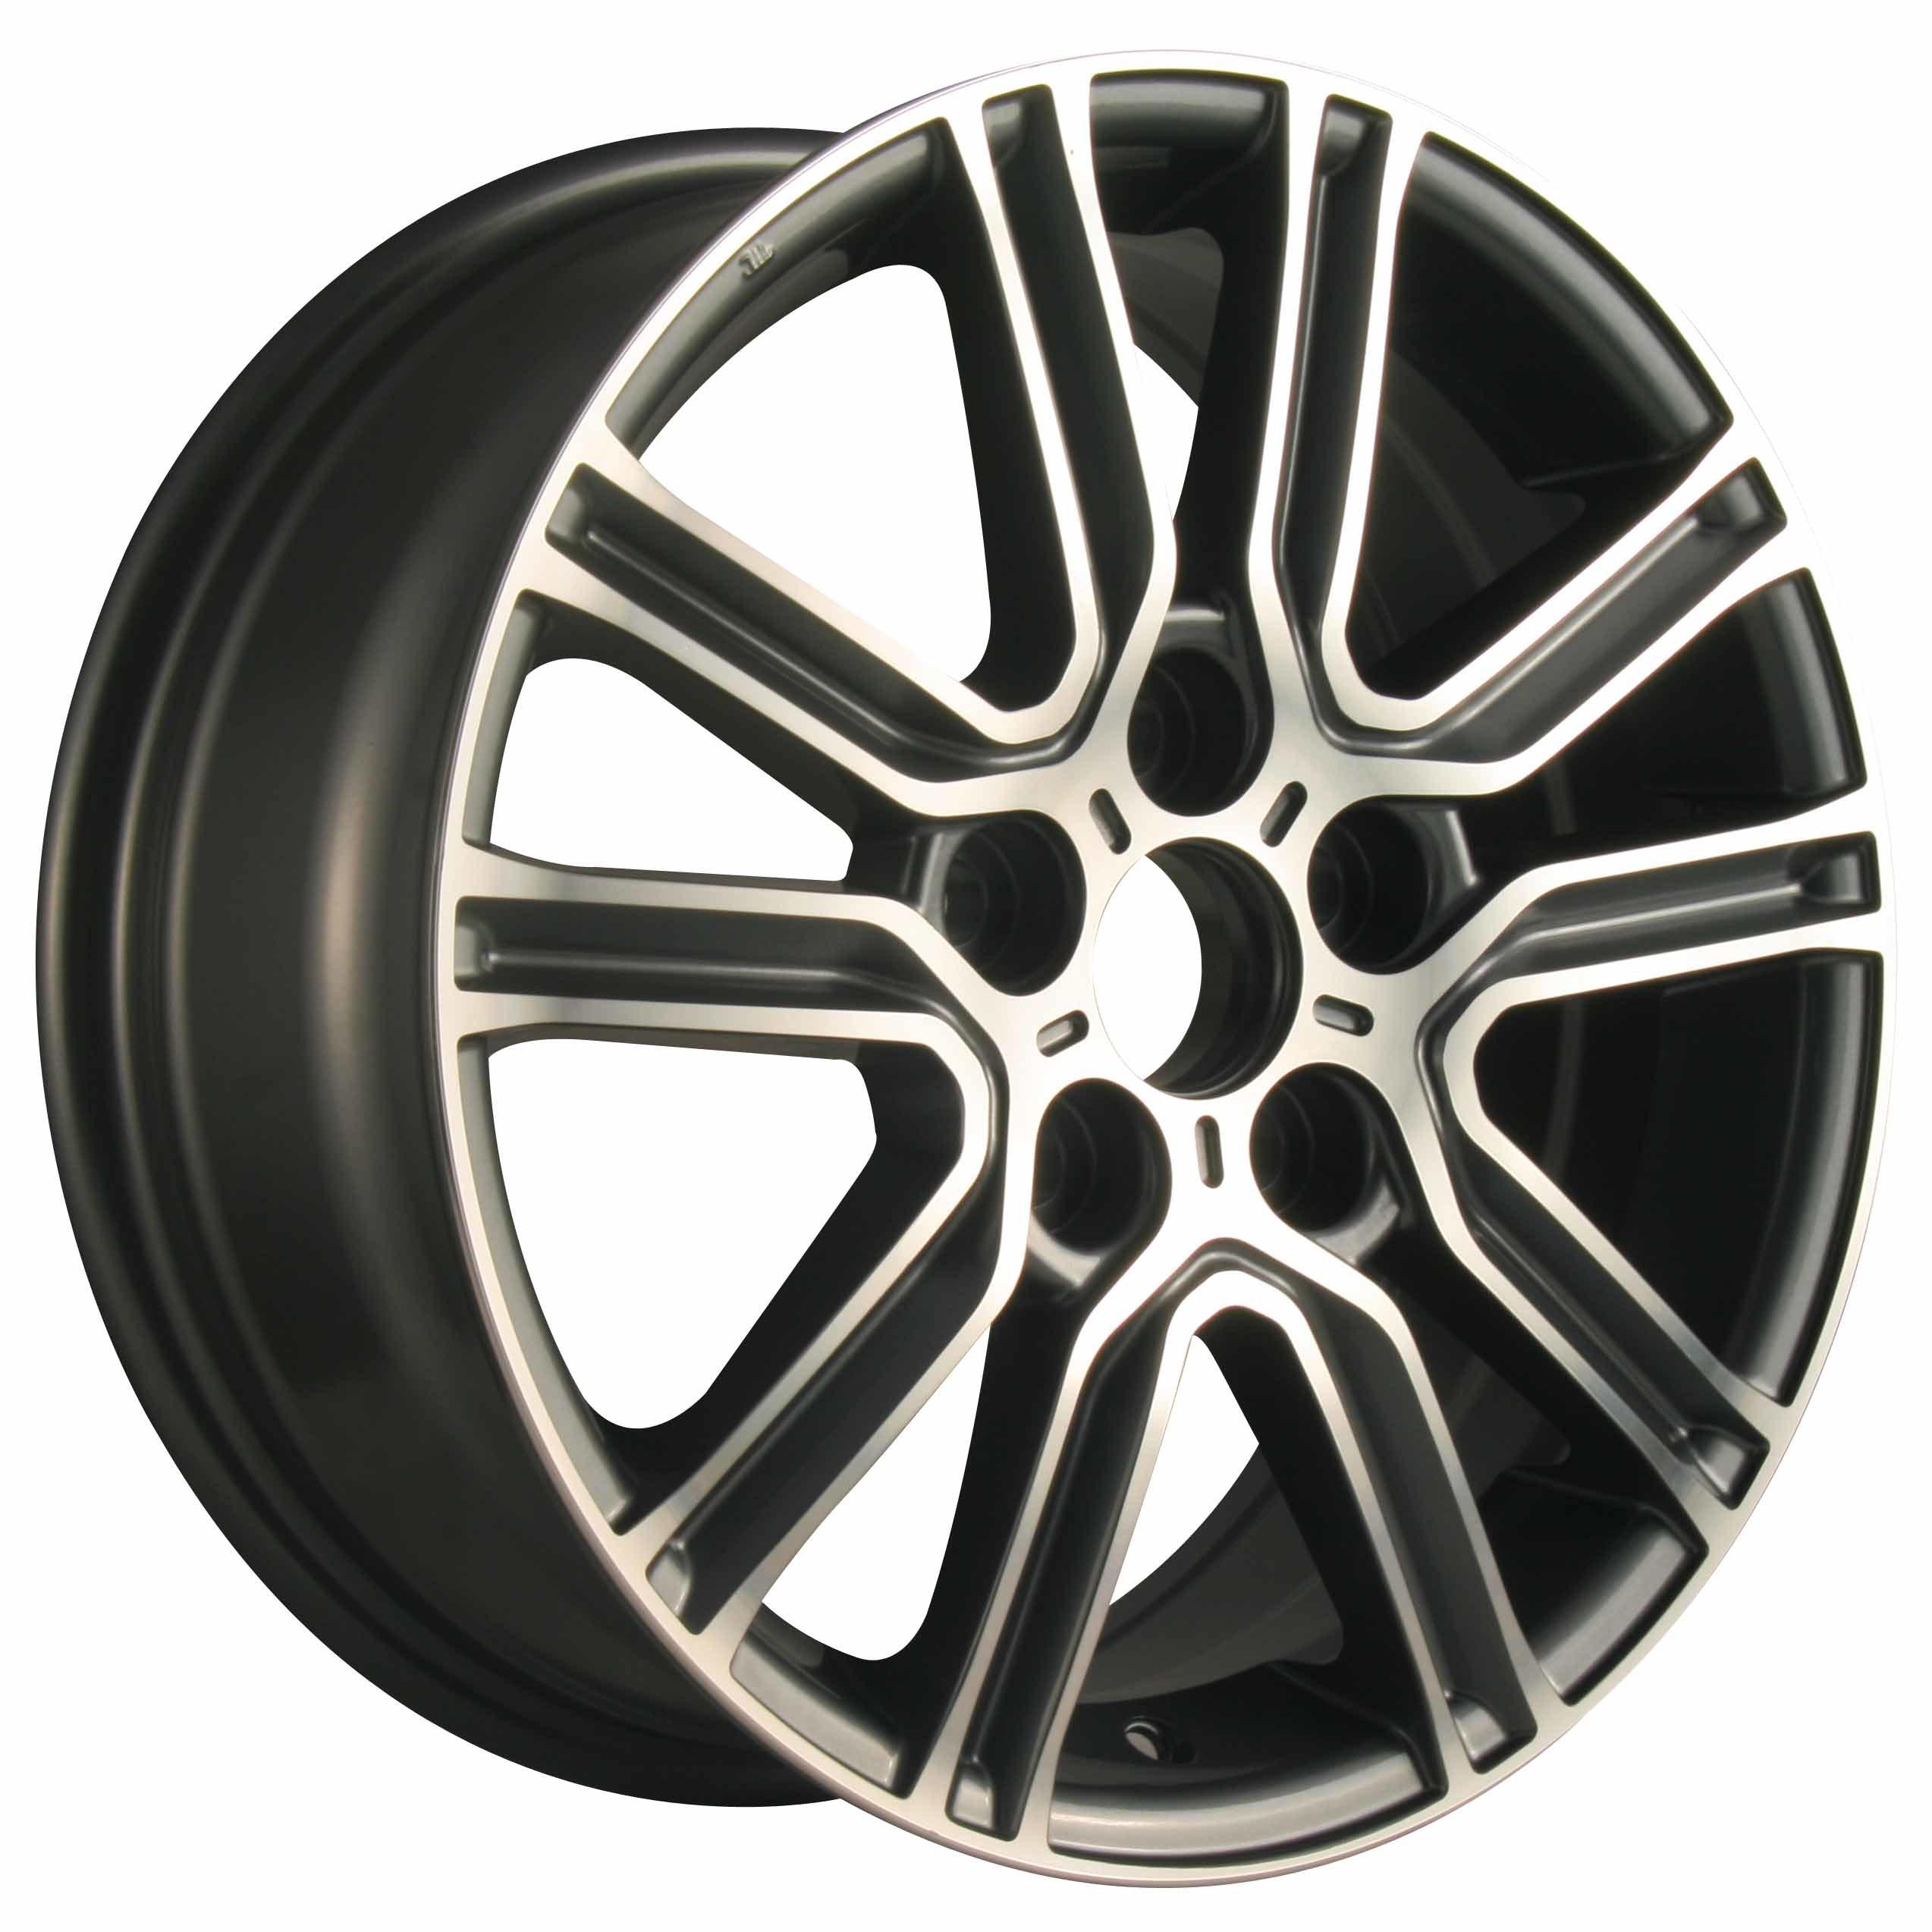 16inch Alloy Wheel Replica Wheel for Toyota 2016 Carmry Special Edition